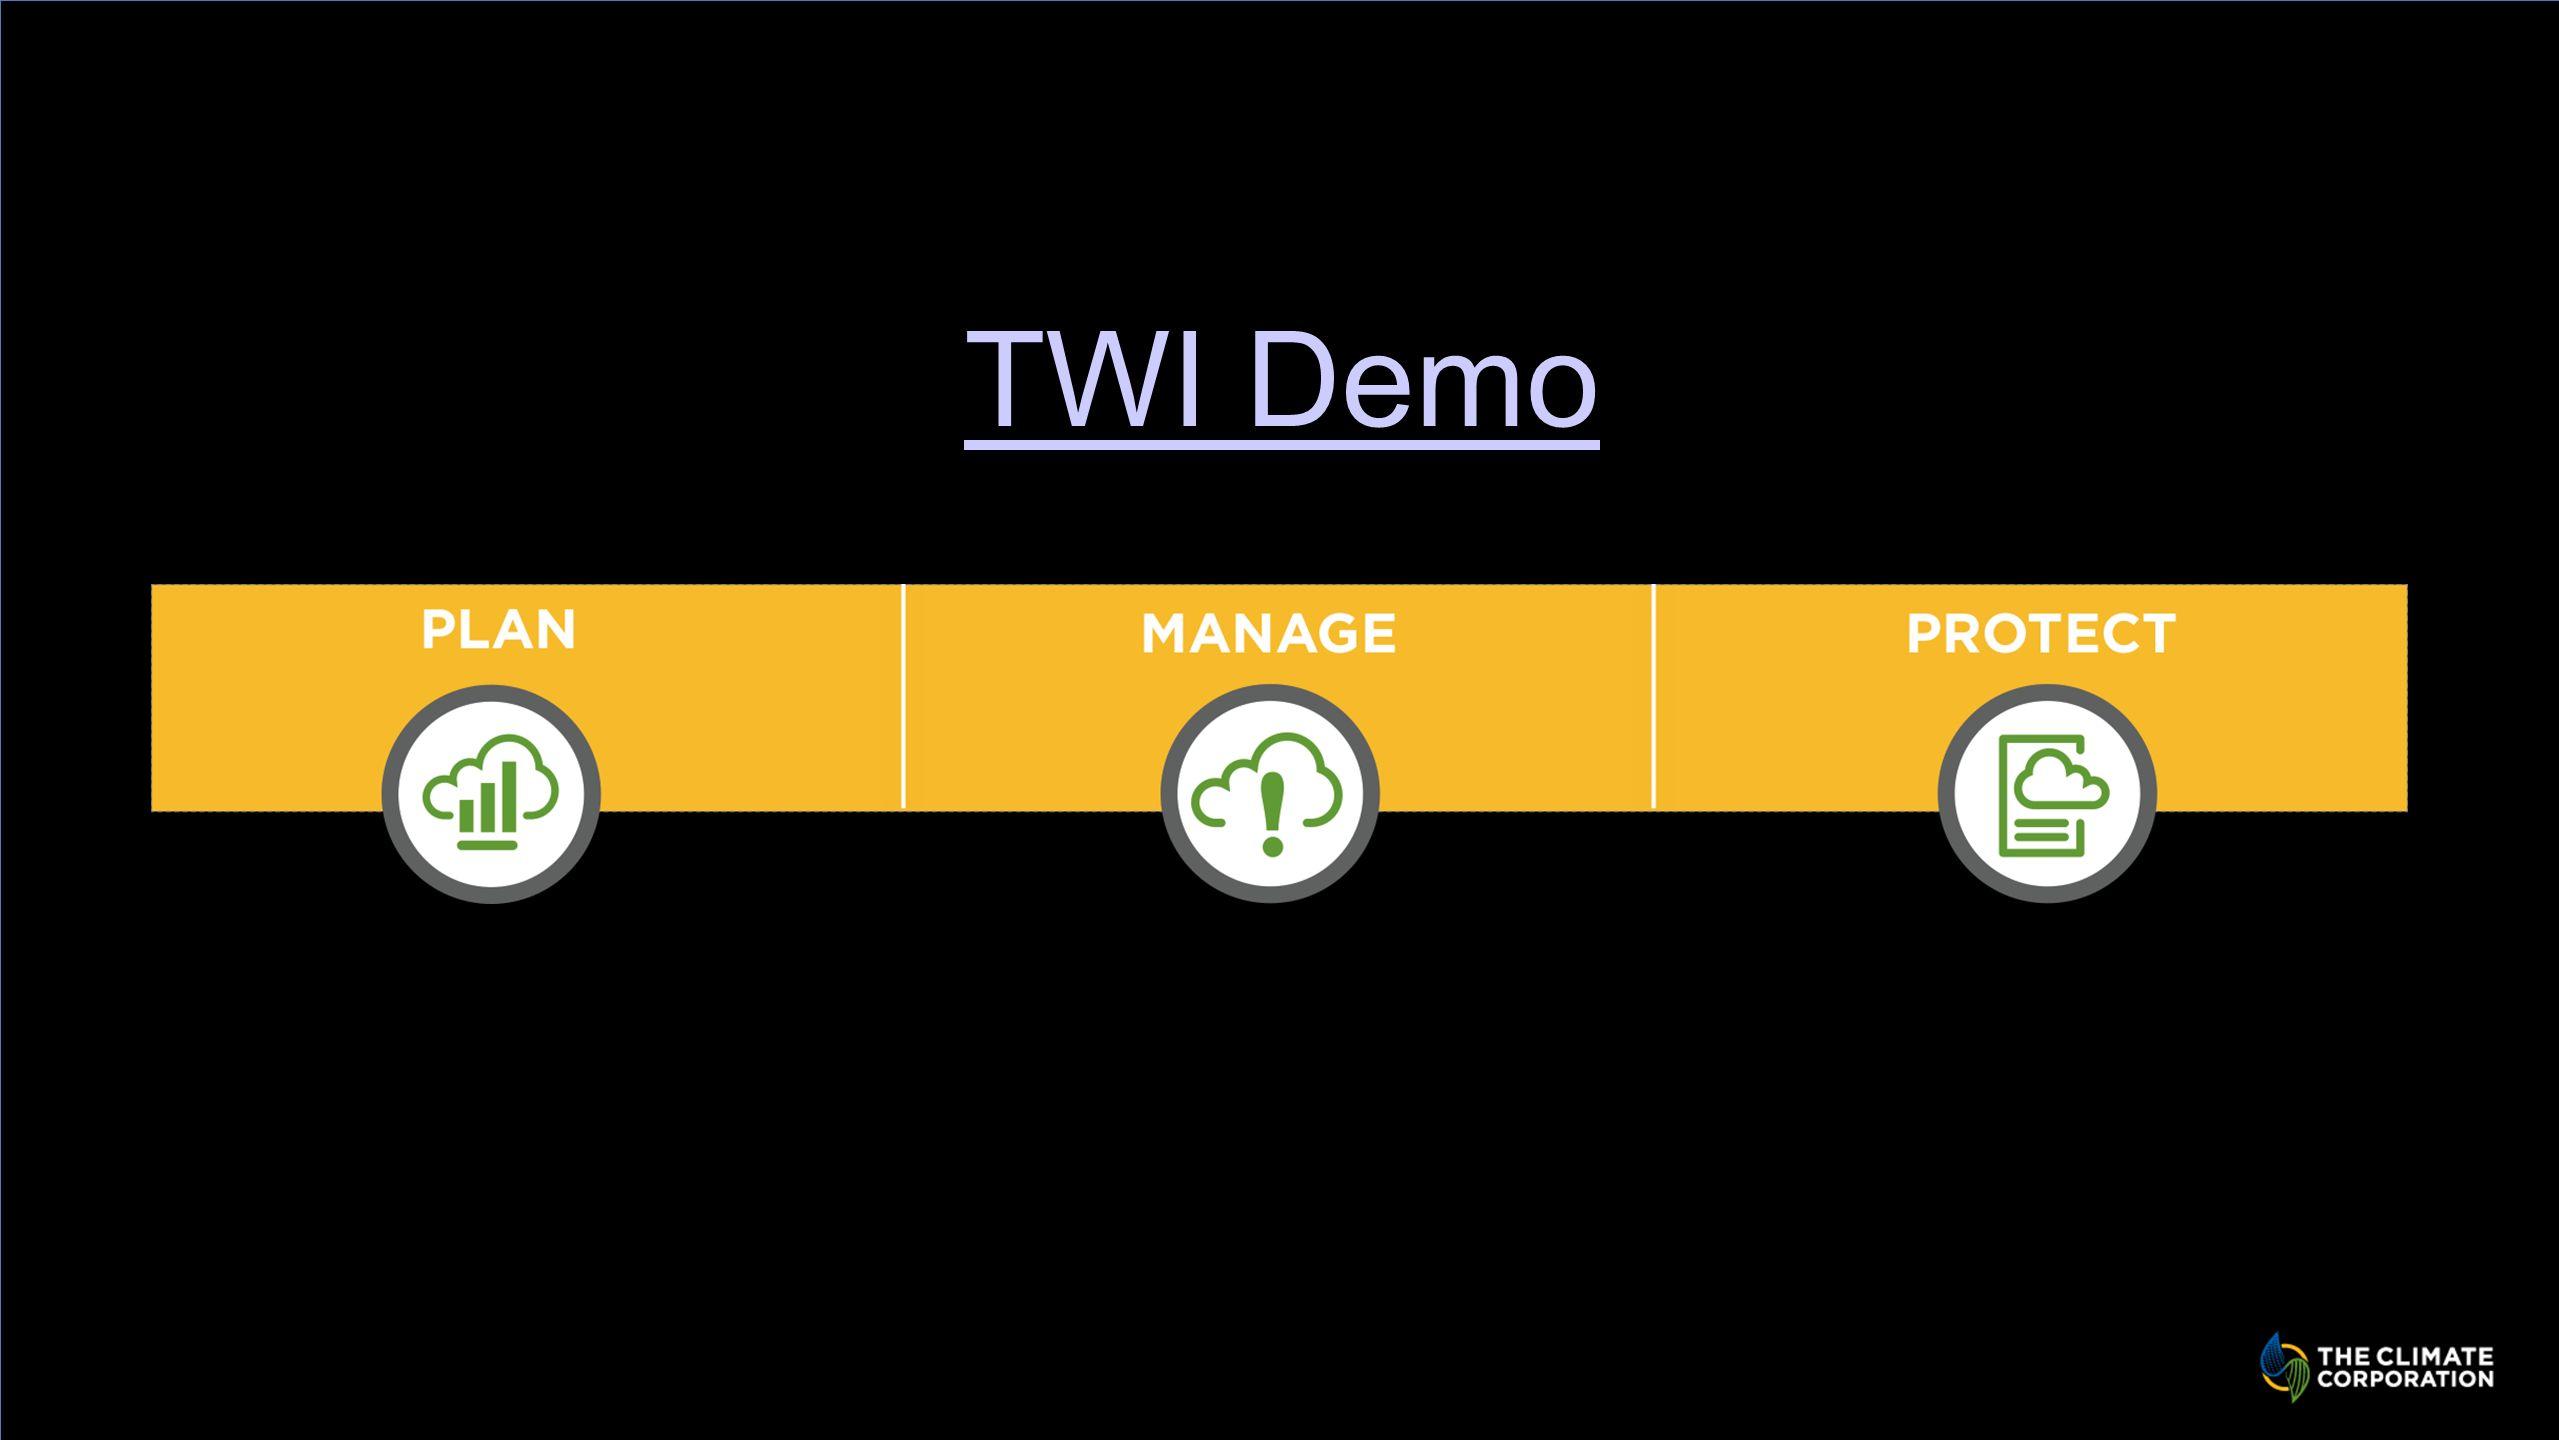 TWI Demo